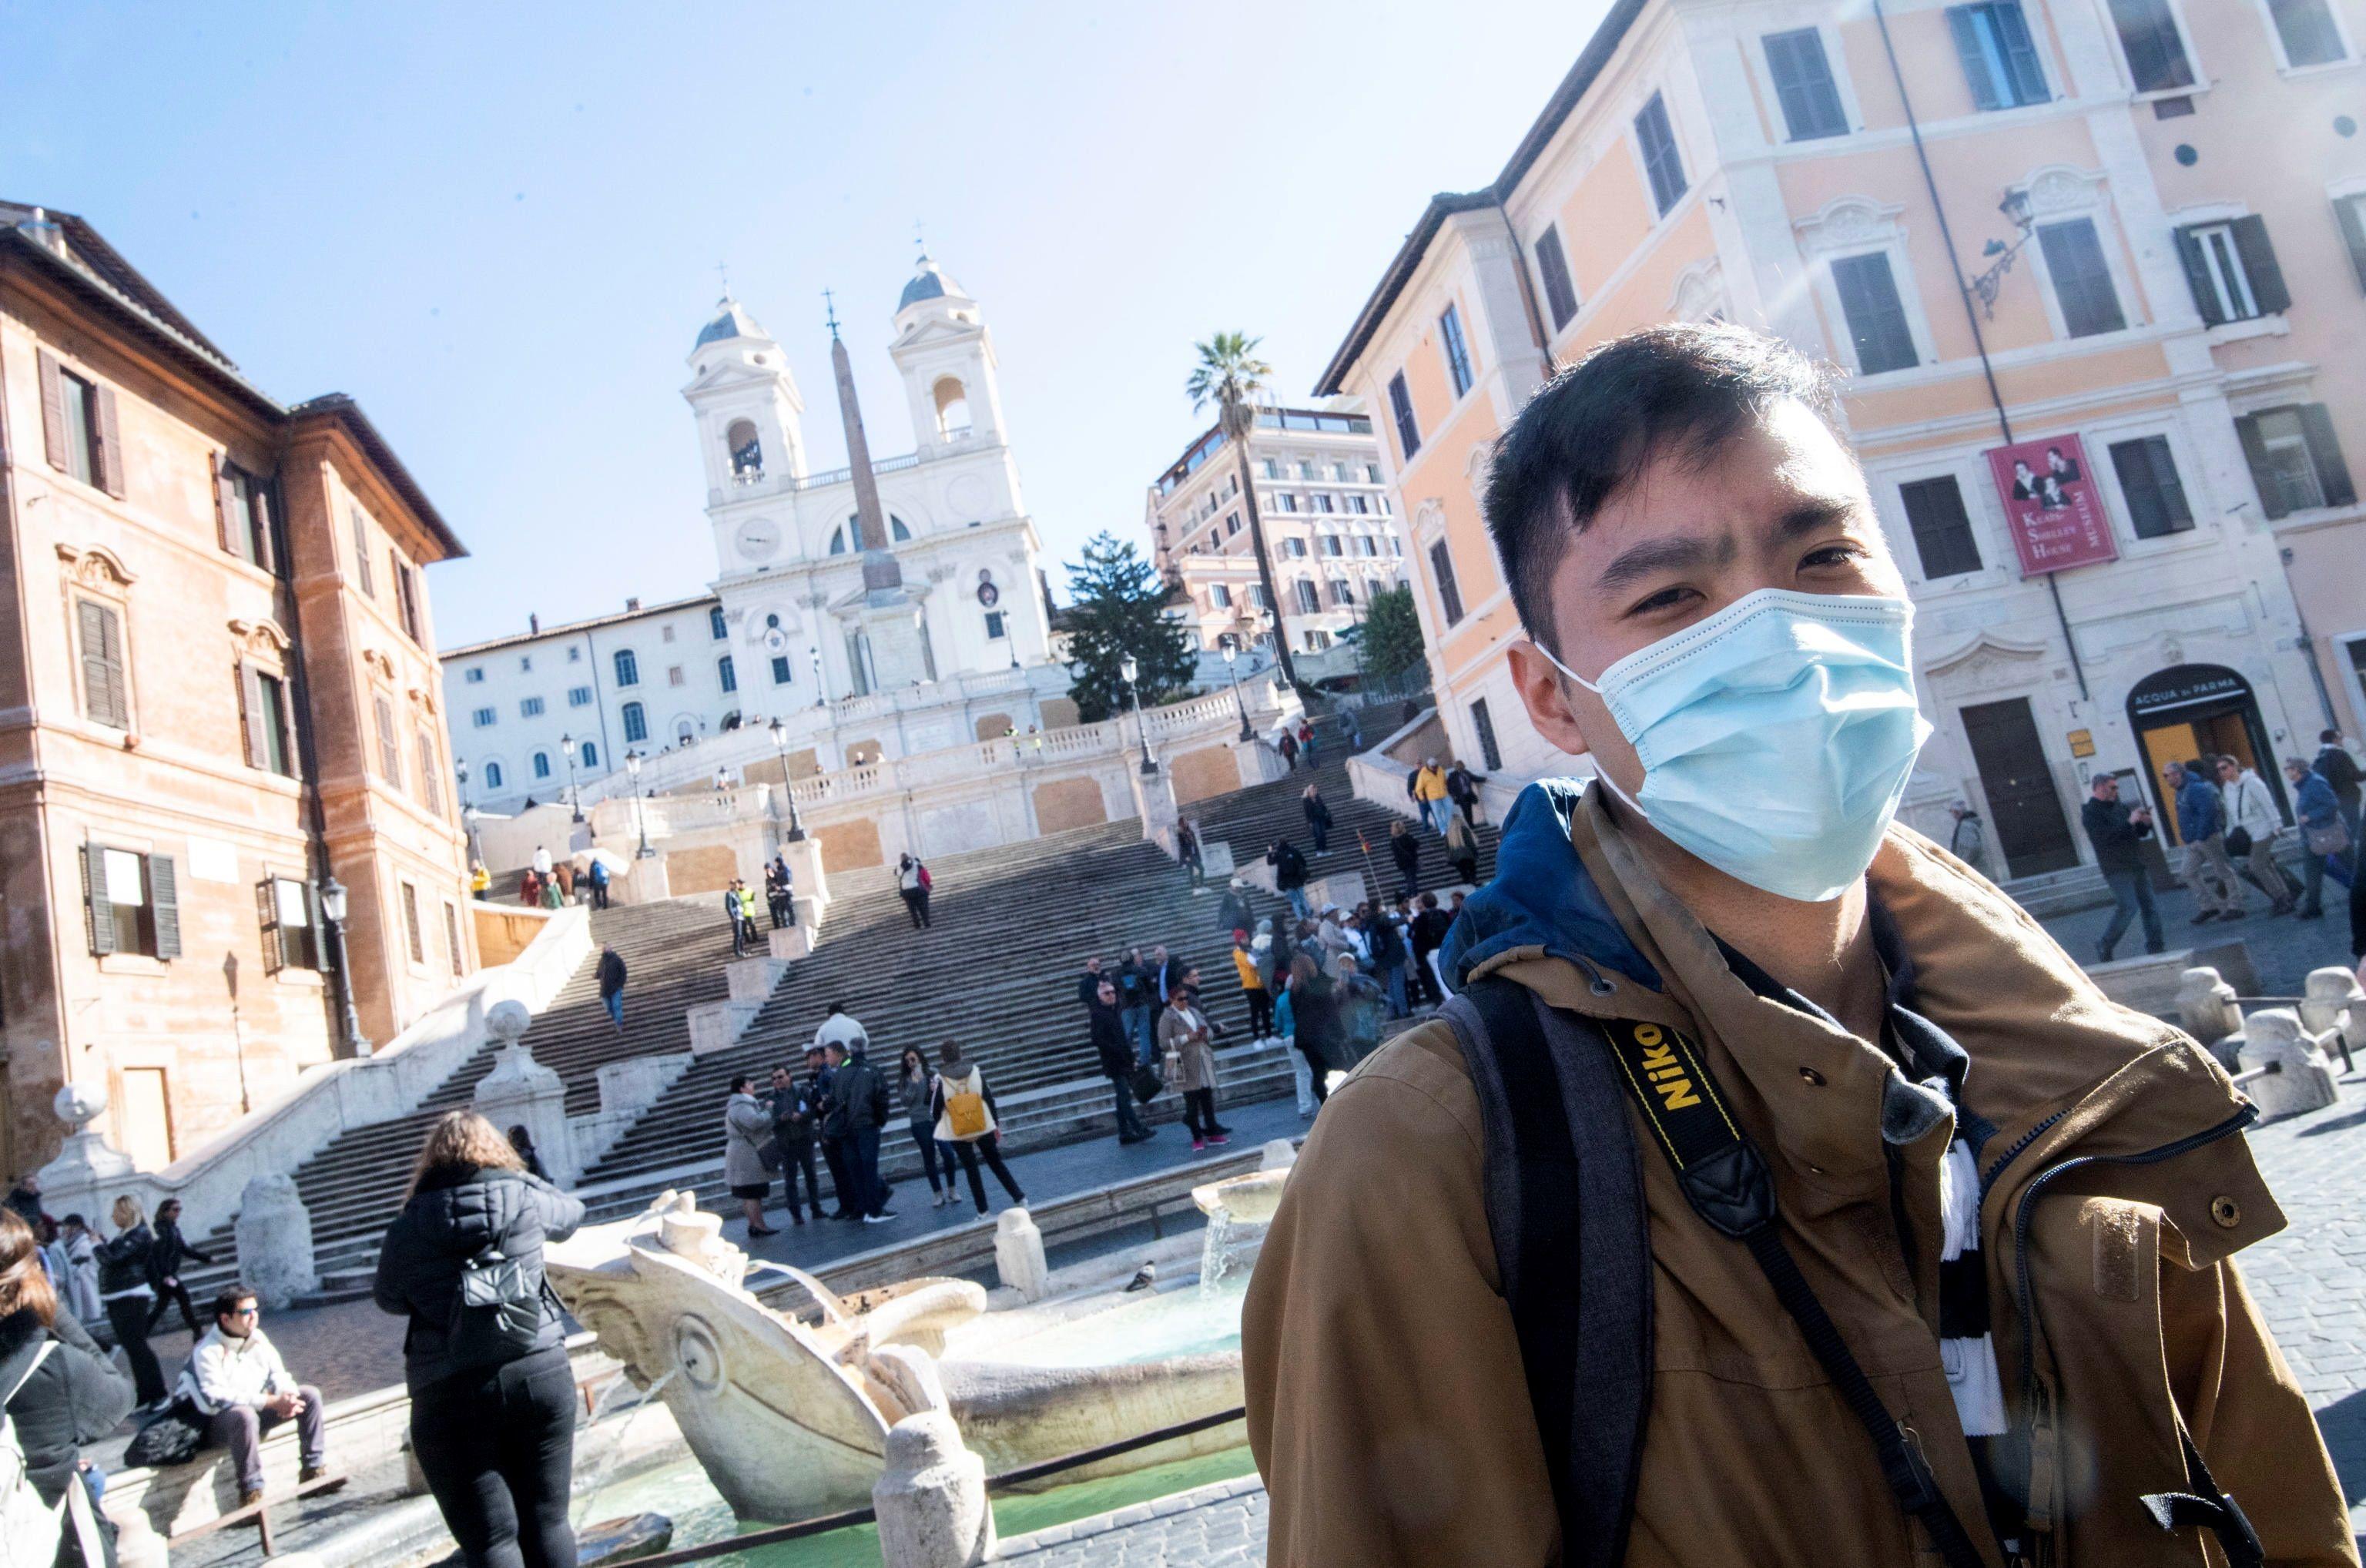 Un turista pasea con mascarilla por la plaza de España, en Roma.